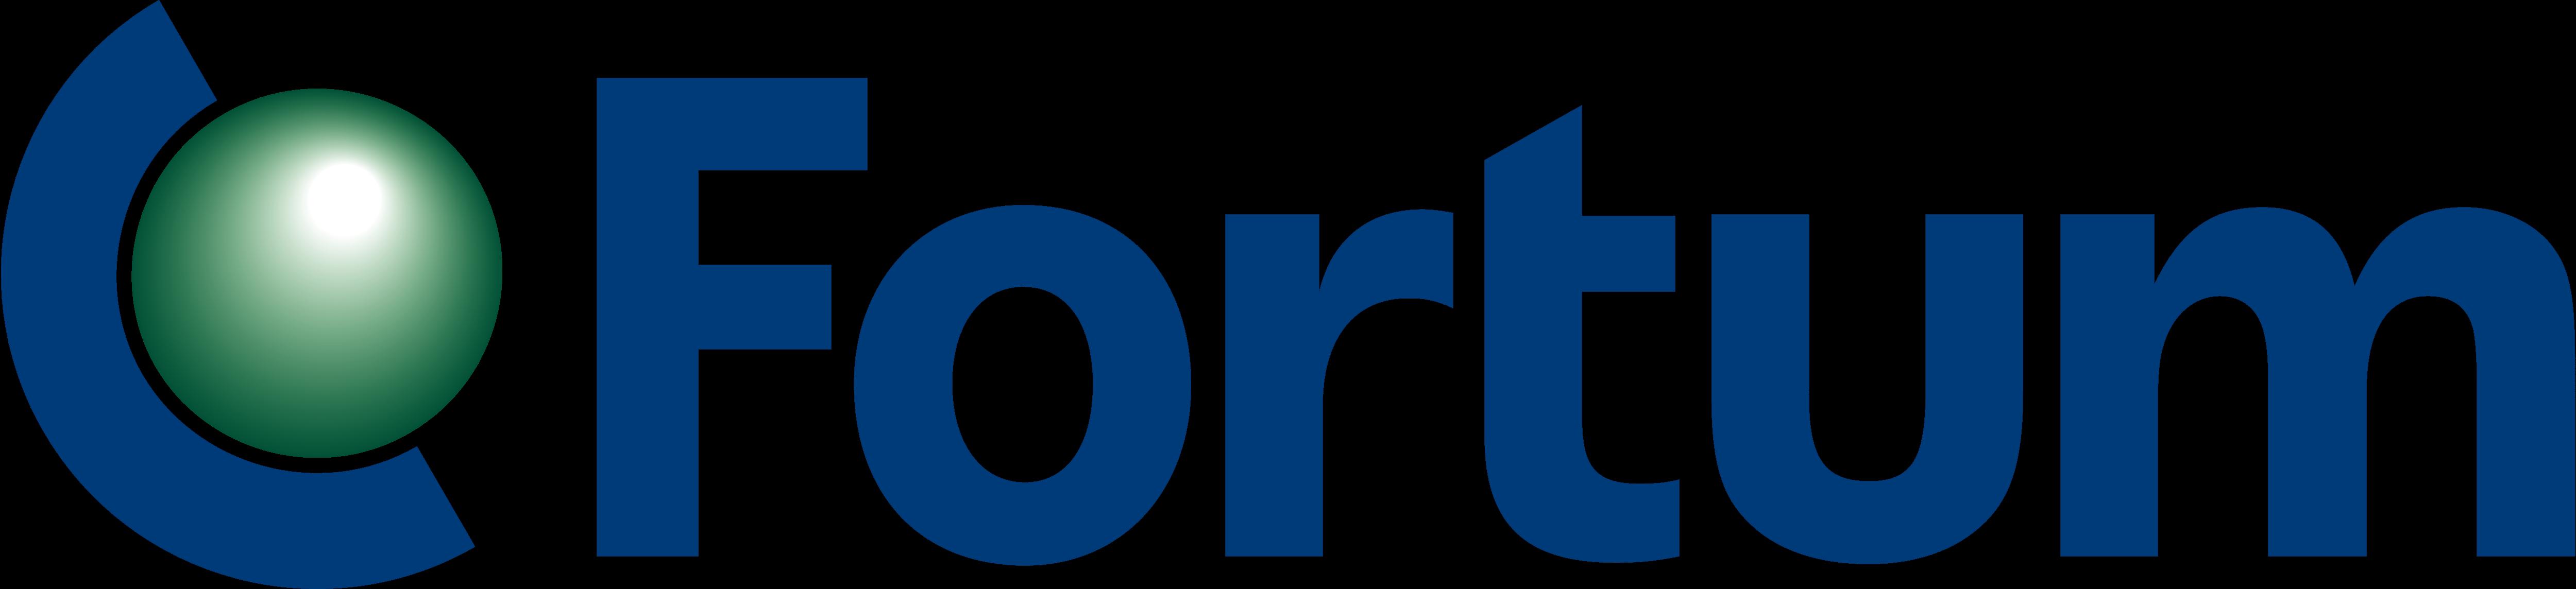 fortum � logos download